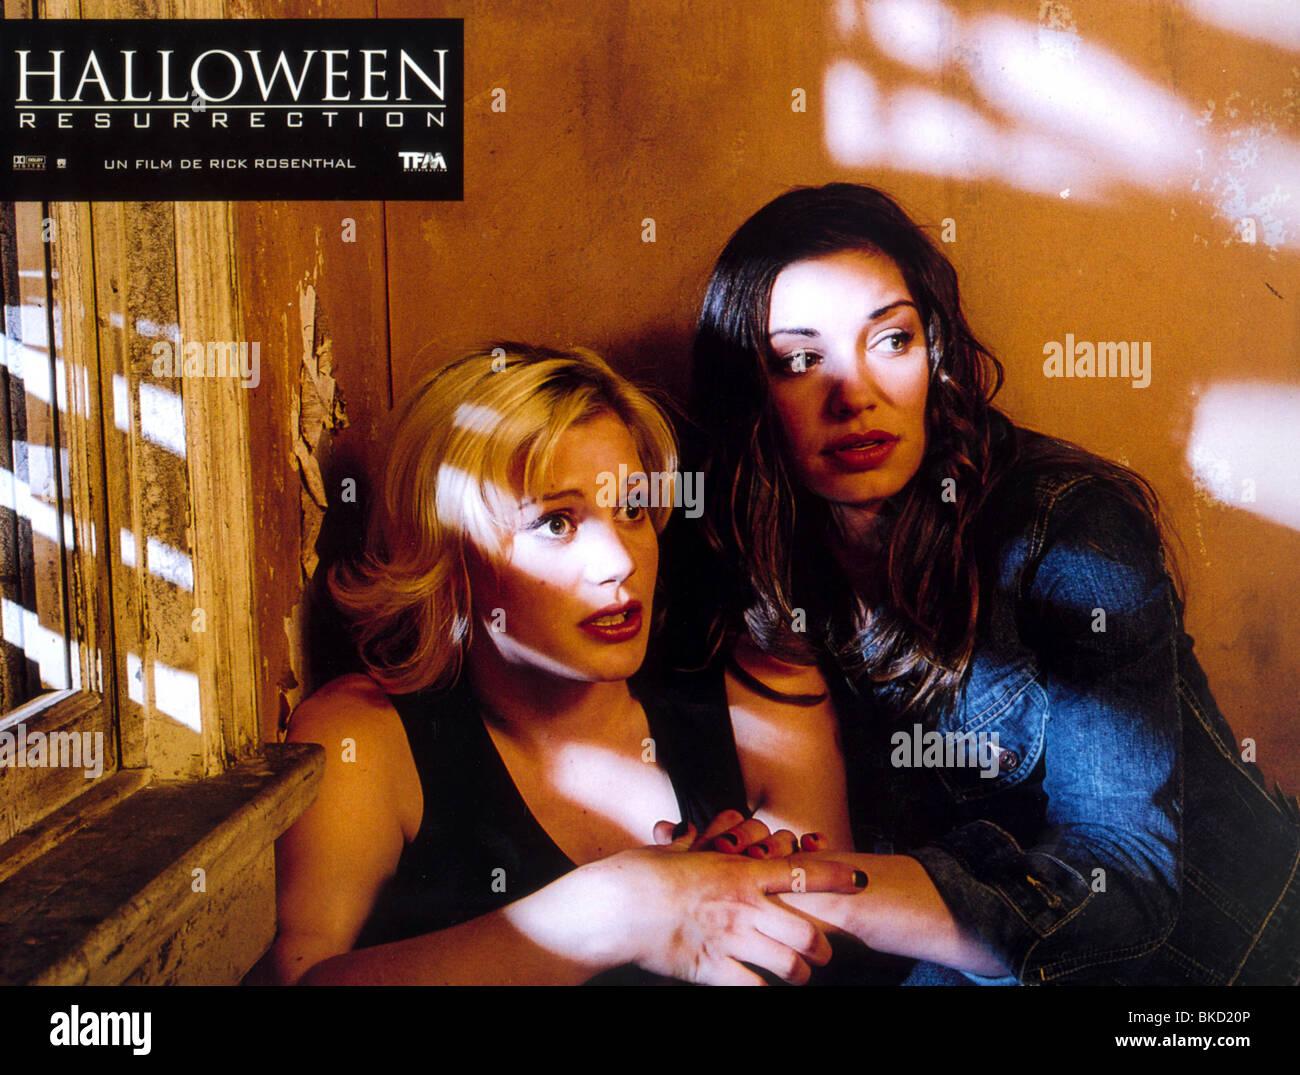 halloween: resurrection (2002) halloween 8 (alt) h2k (alt) h2k